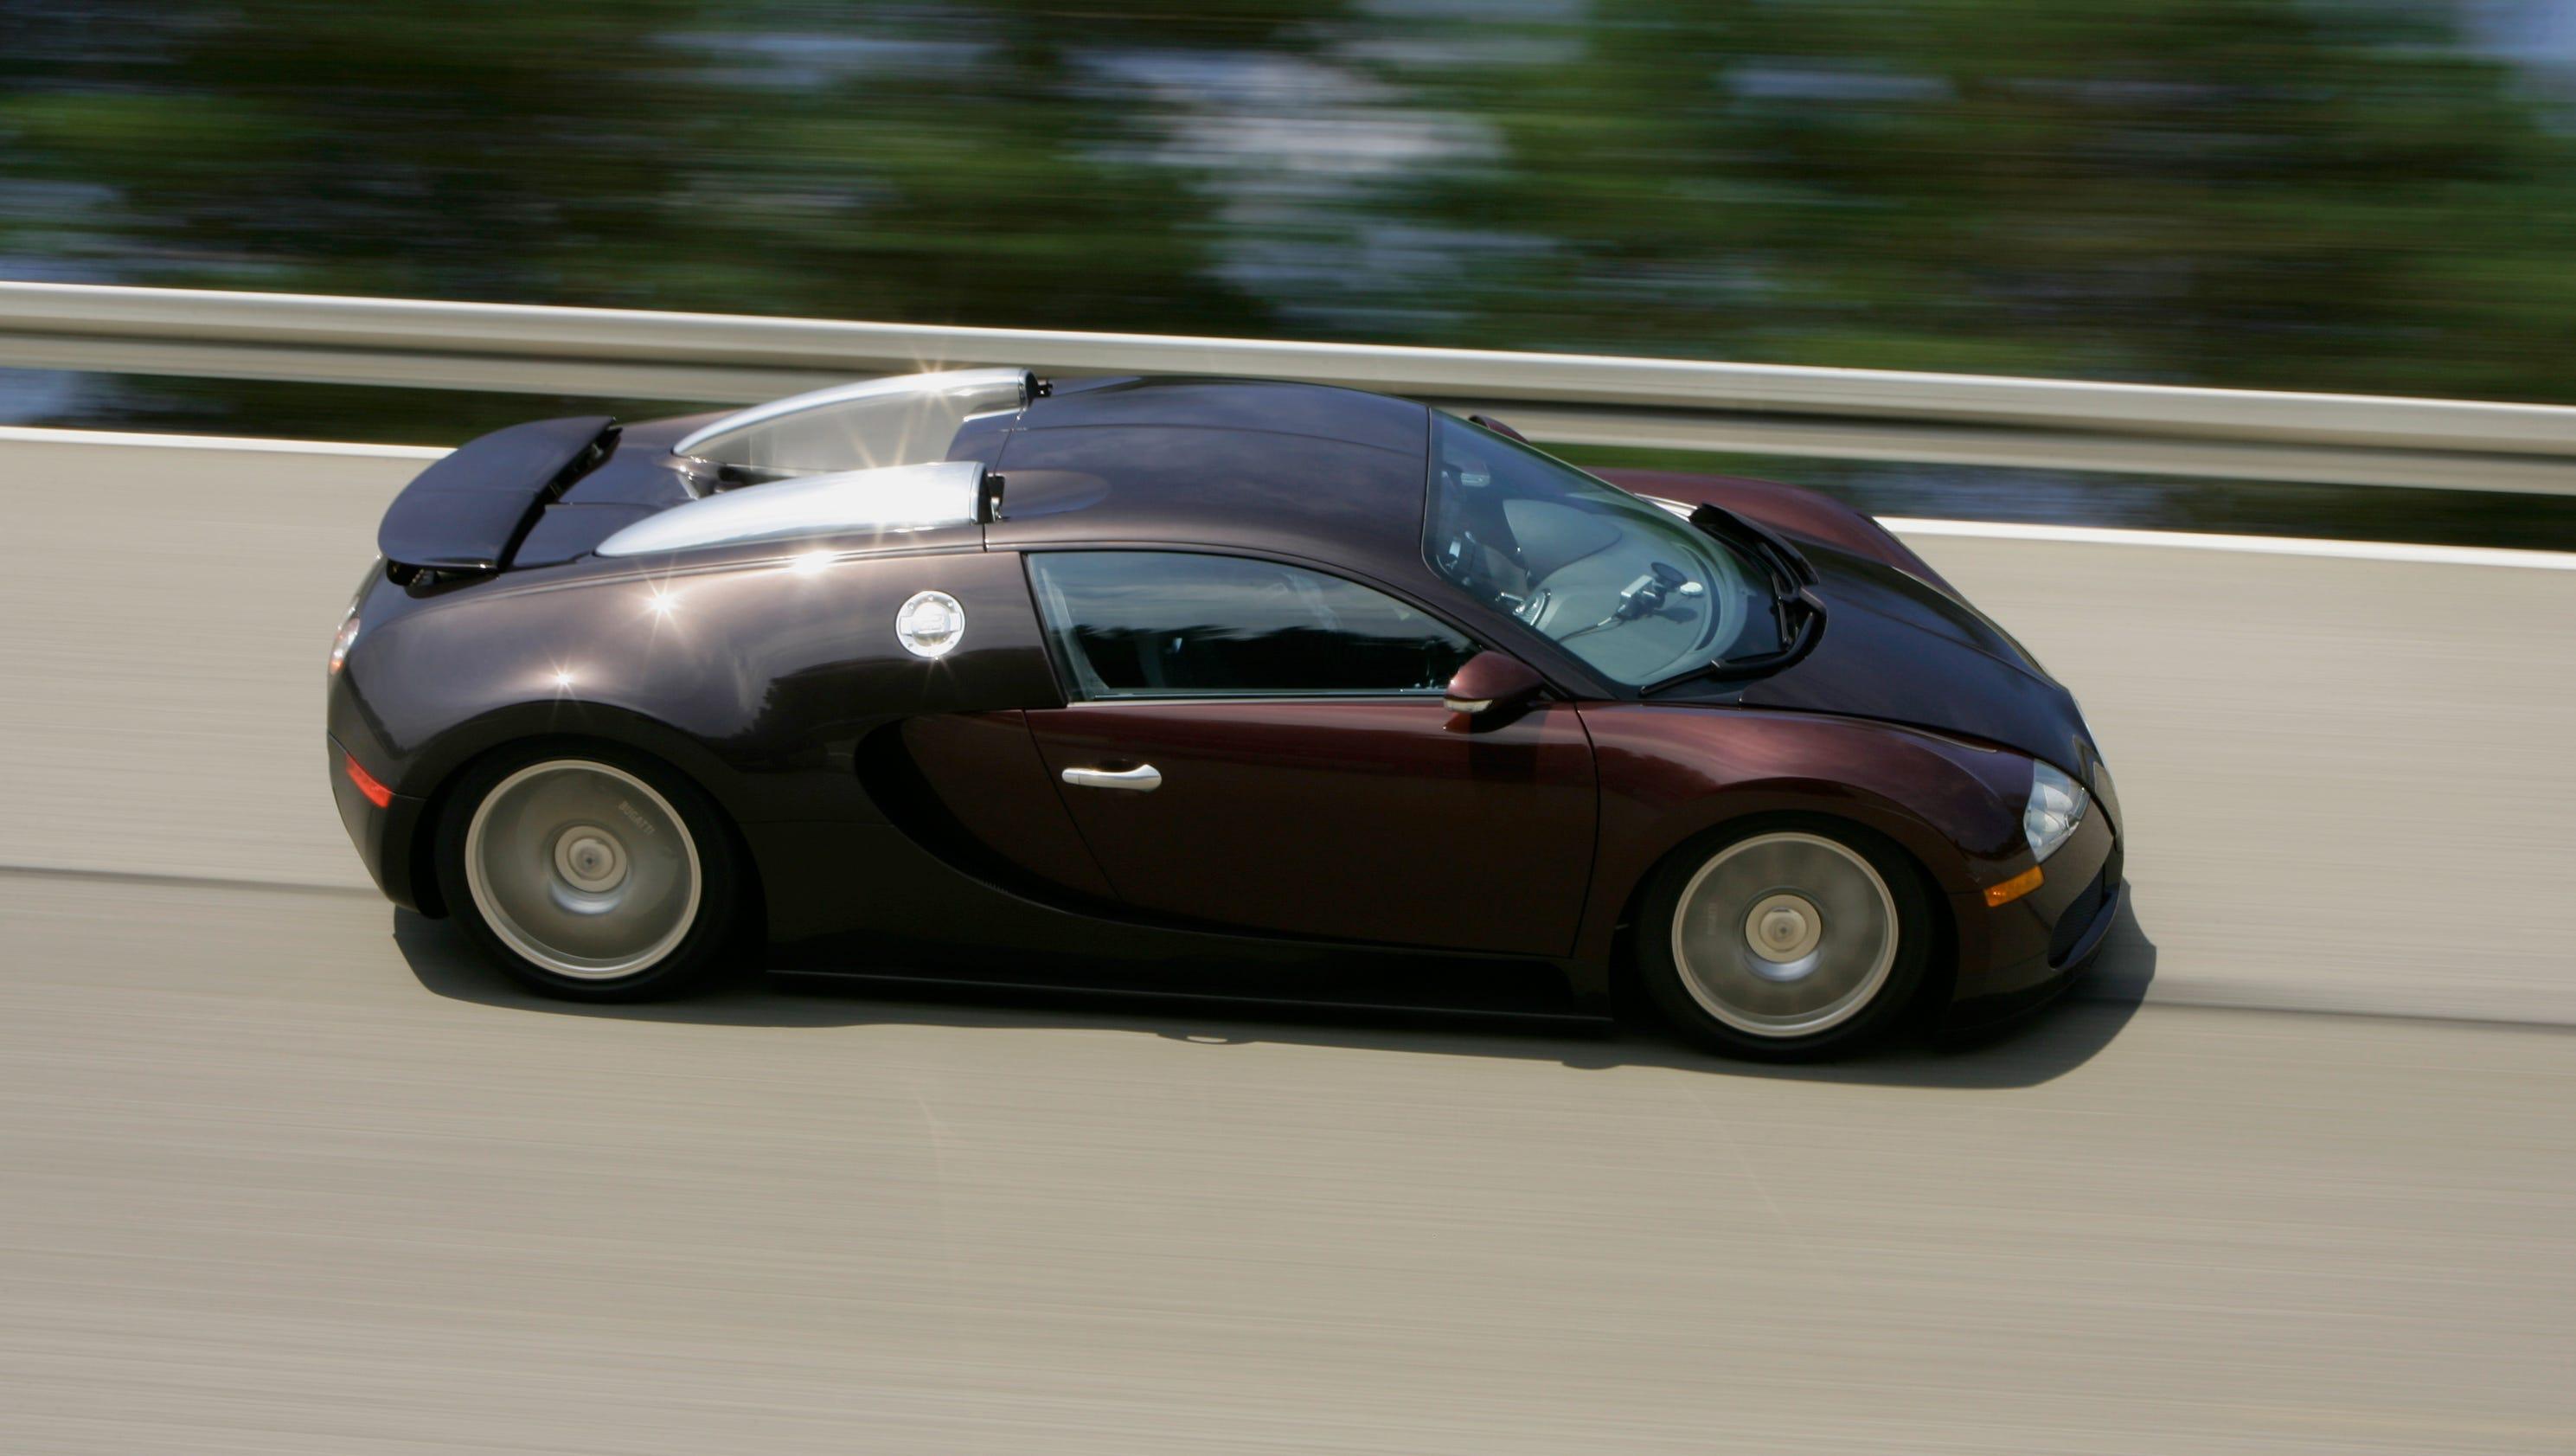 635602866591746537-BugattiVeyron06 Exciting Bugatti Veyron New Model 2015 Cars Trend